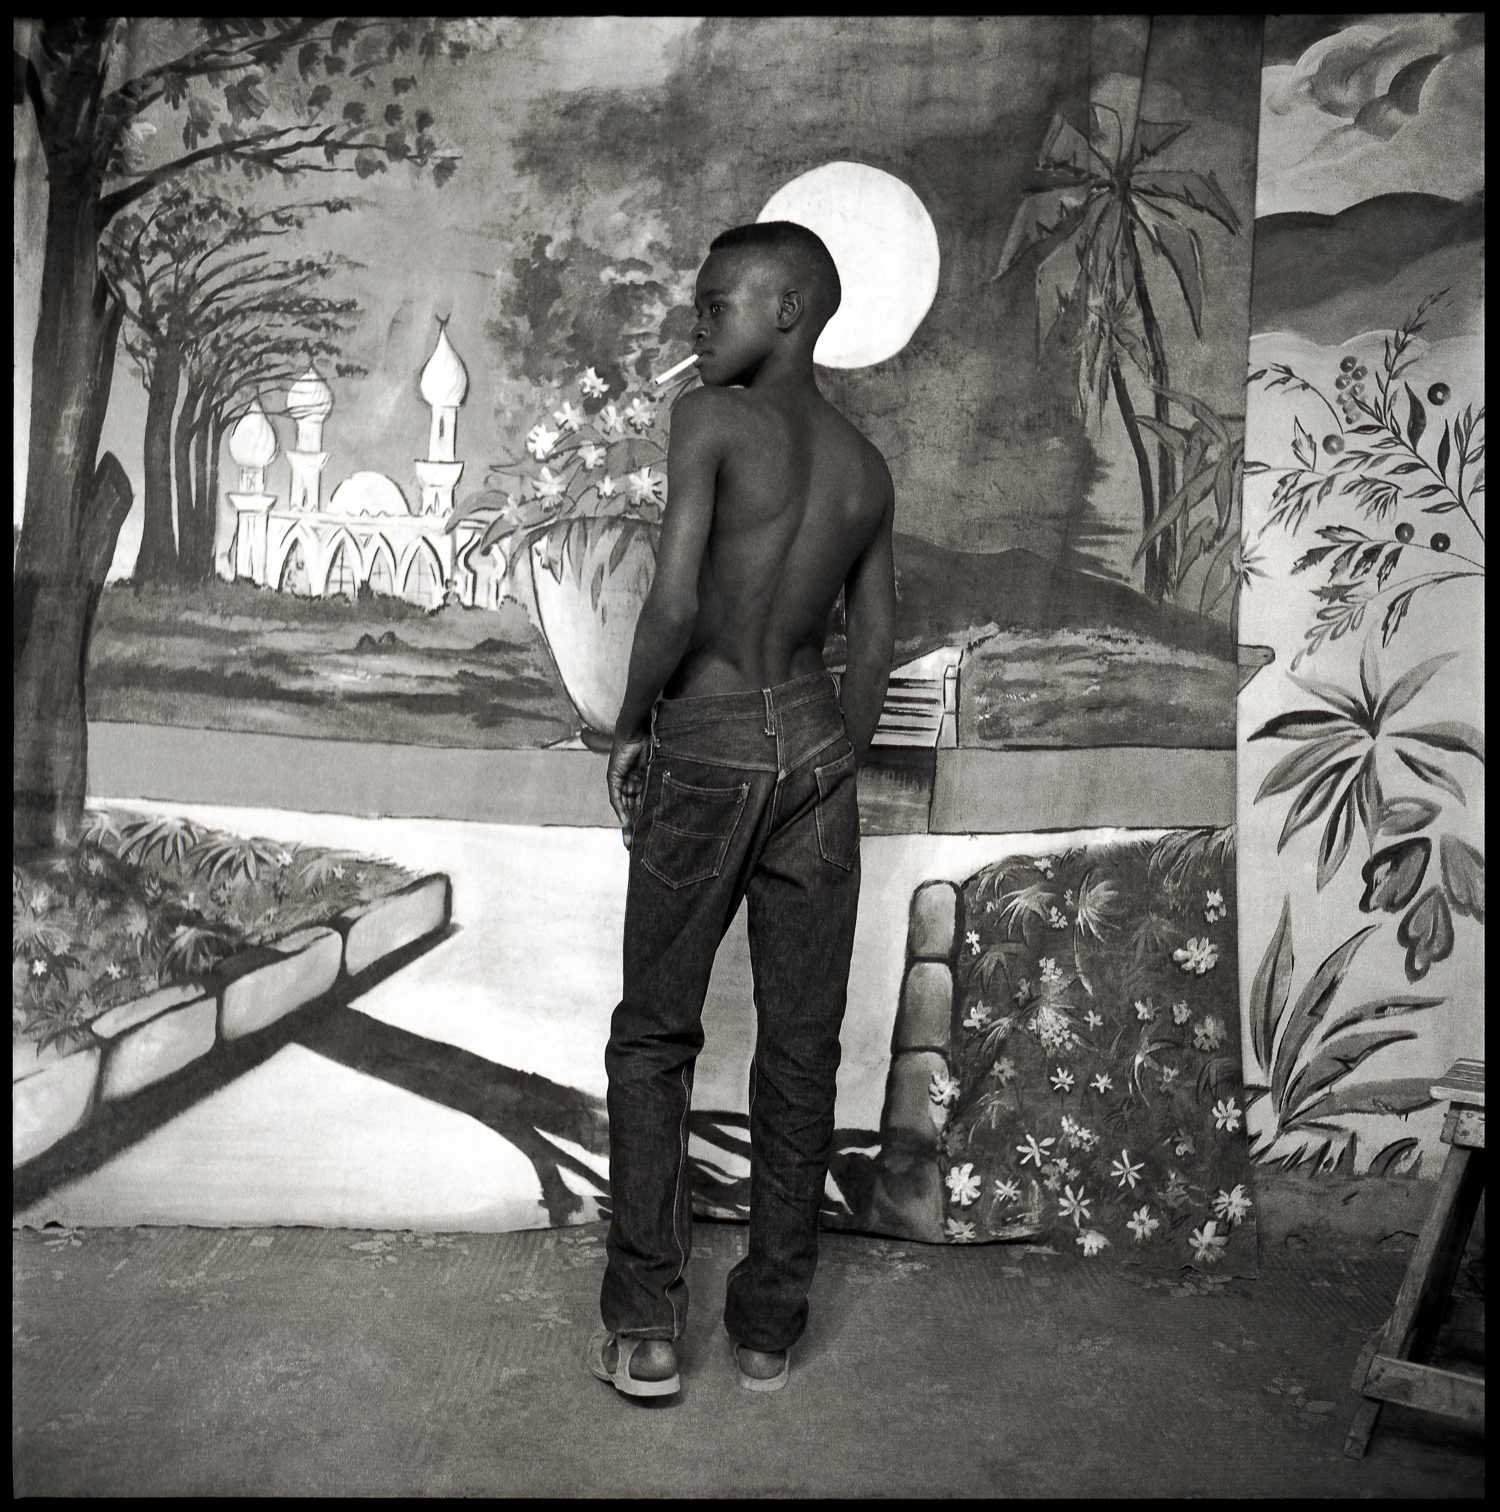 © photo Abdourahmane Sakaly, Jeune garçon avec cigarette en studio, Bamako, Mali vers 1965